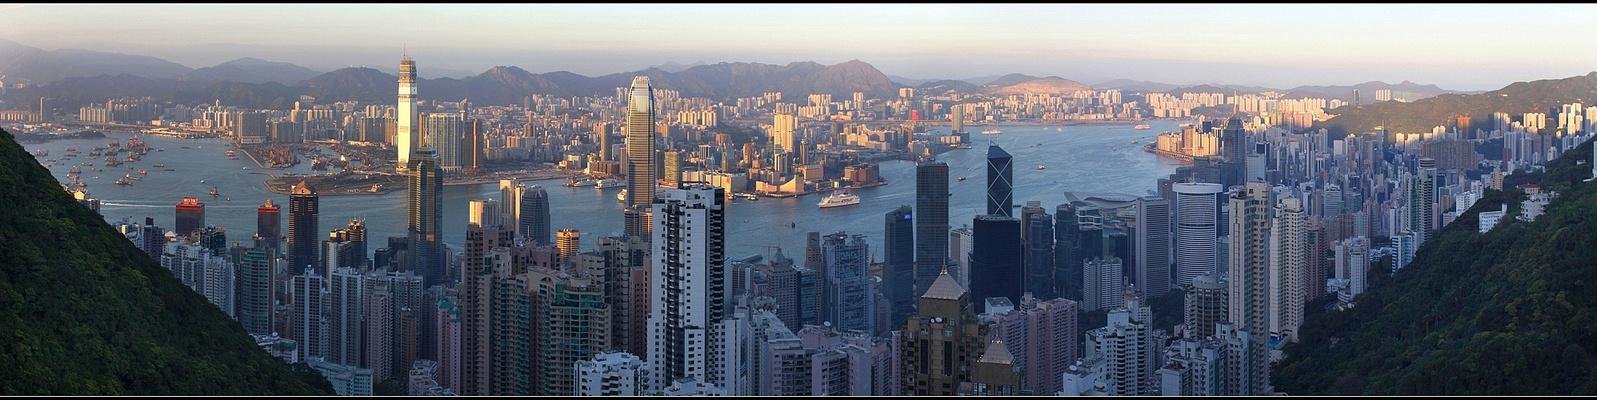 Sunset view - Hong Kong